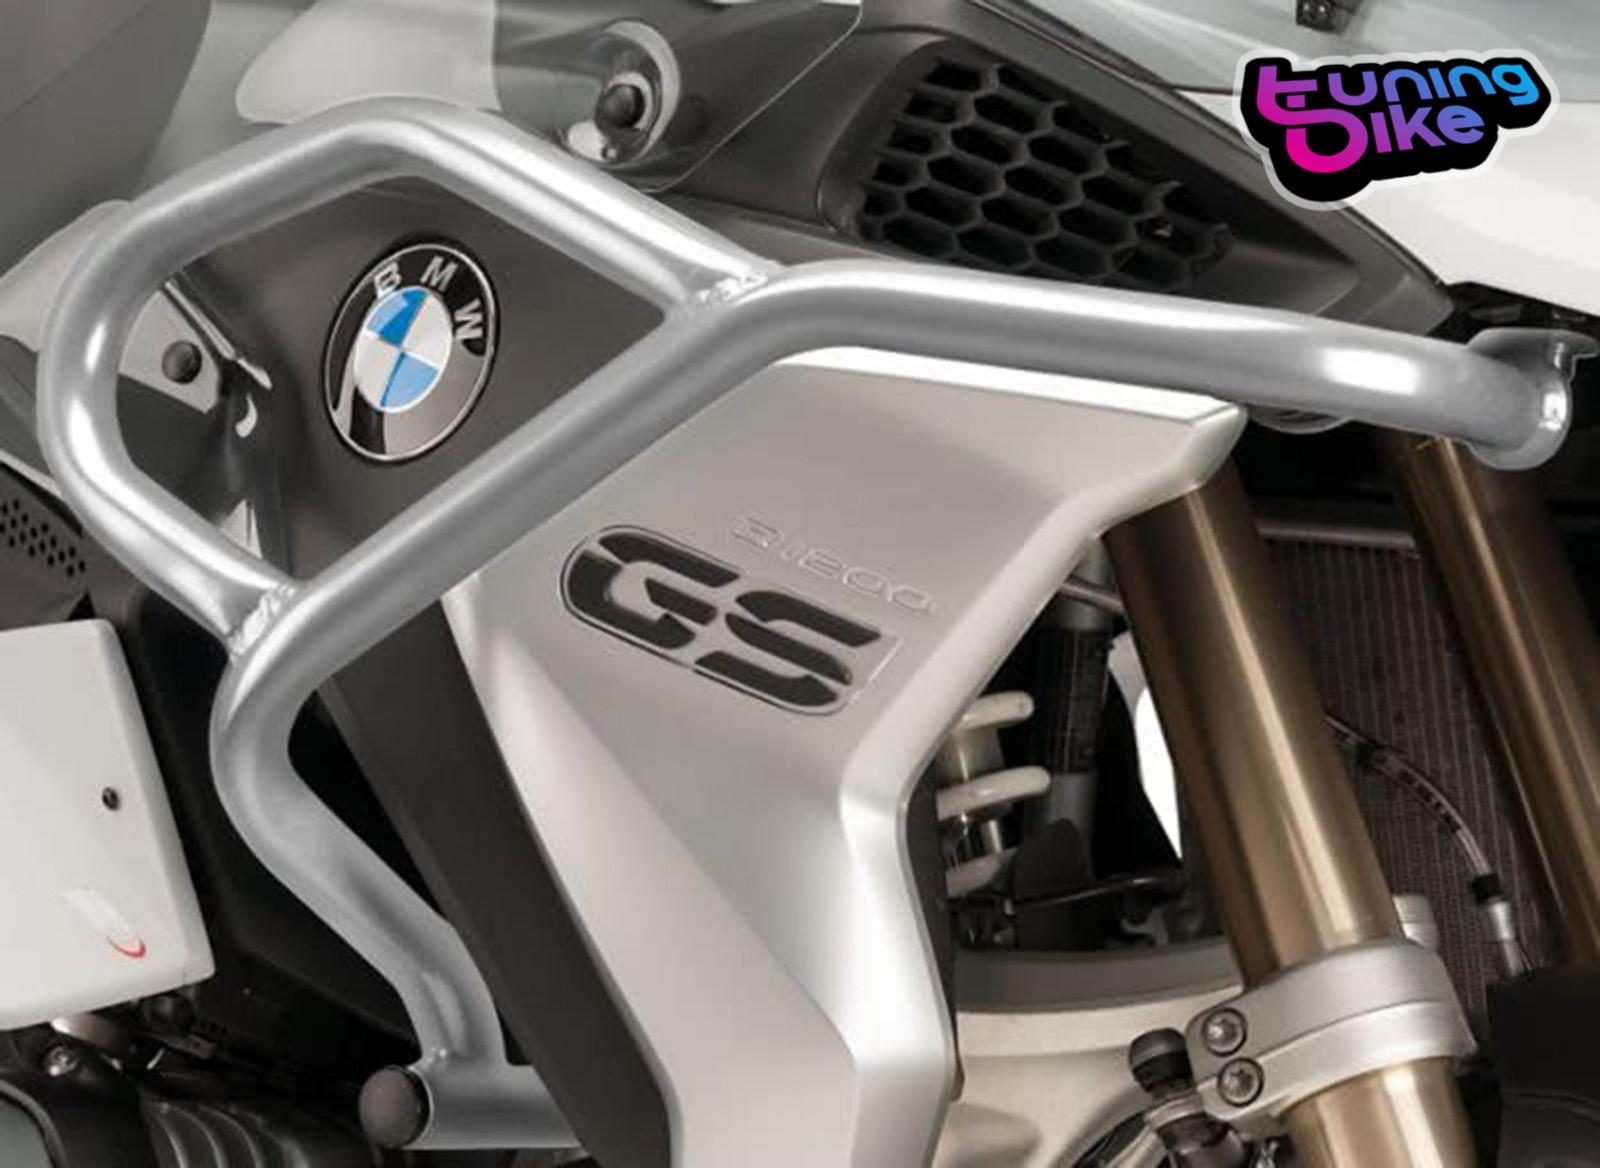 STURZBUGEL PUIG BMW R NINE T URBAN G//S 17/'-18/' SCHWARZ